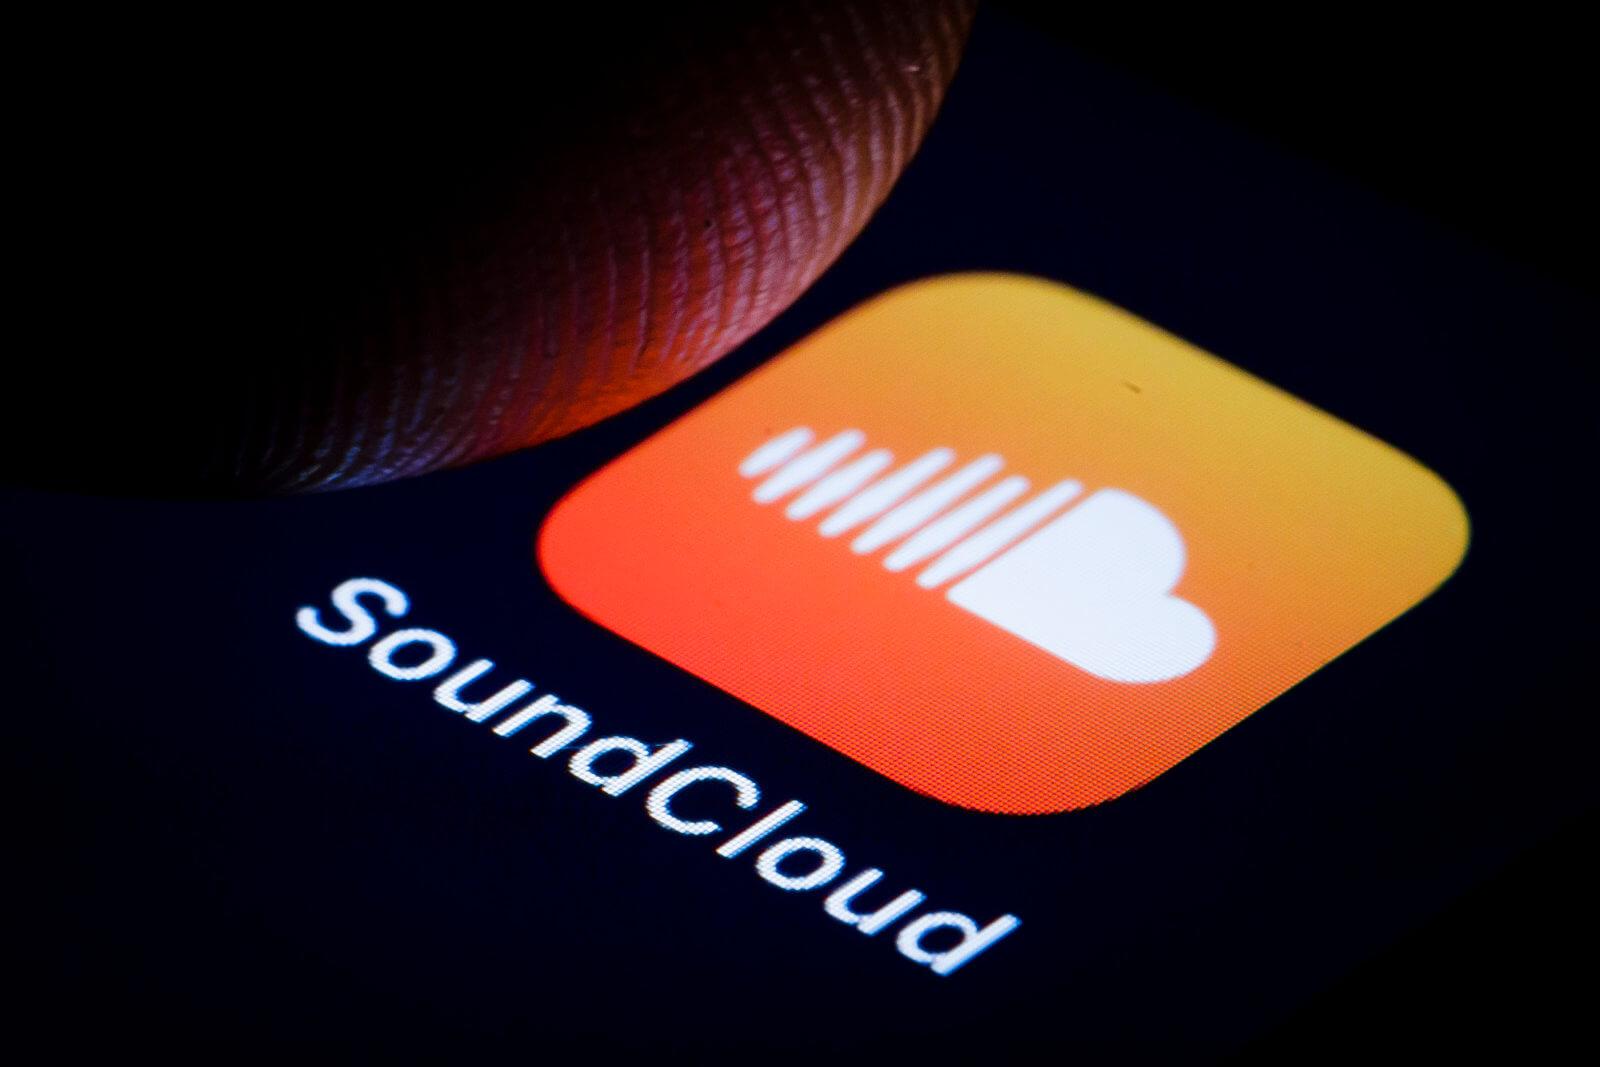 SoundCloud gross annual revenue